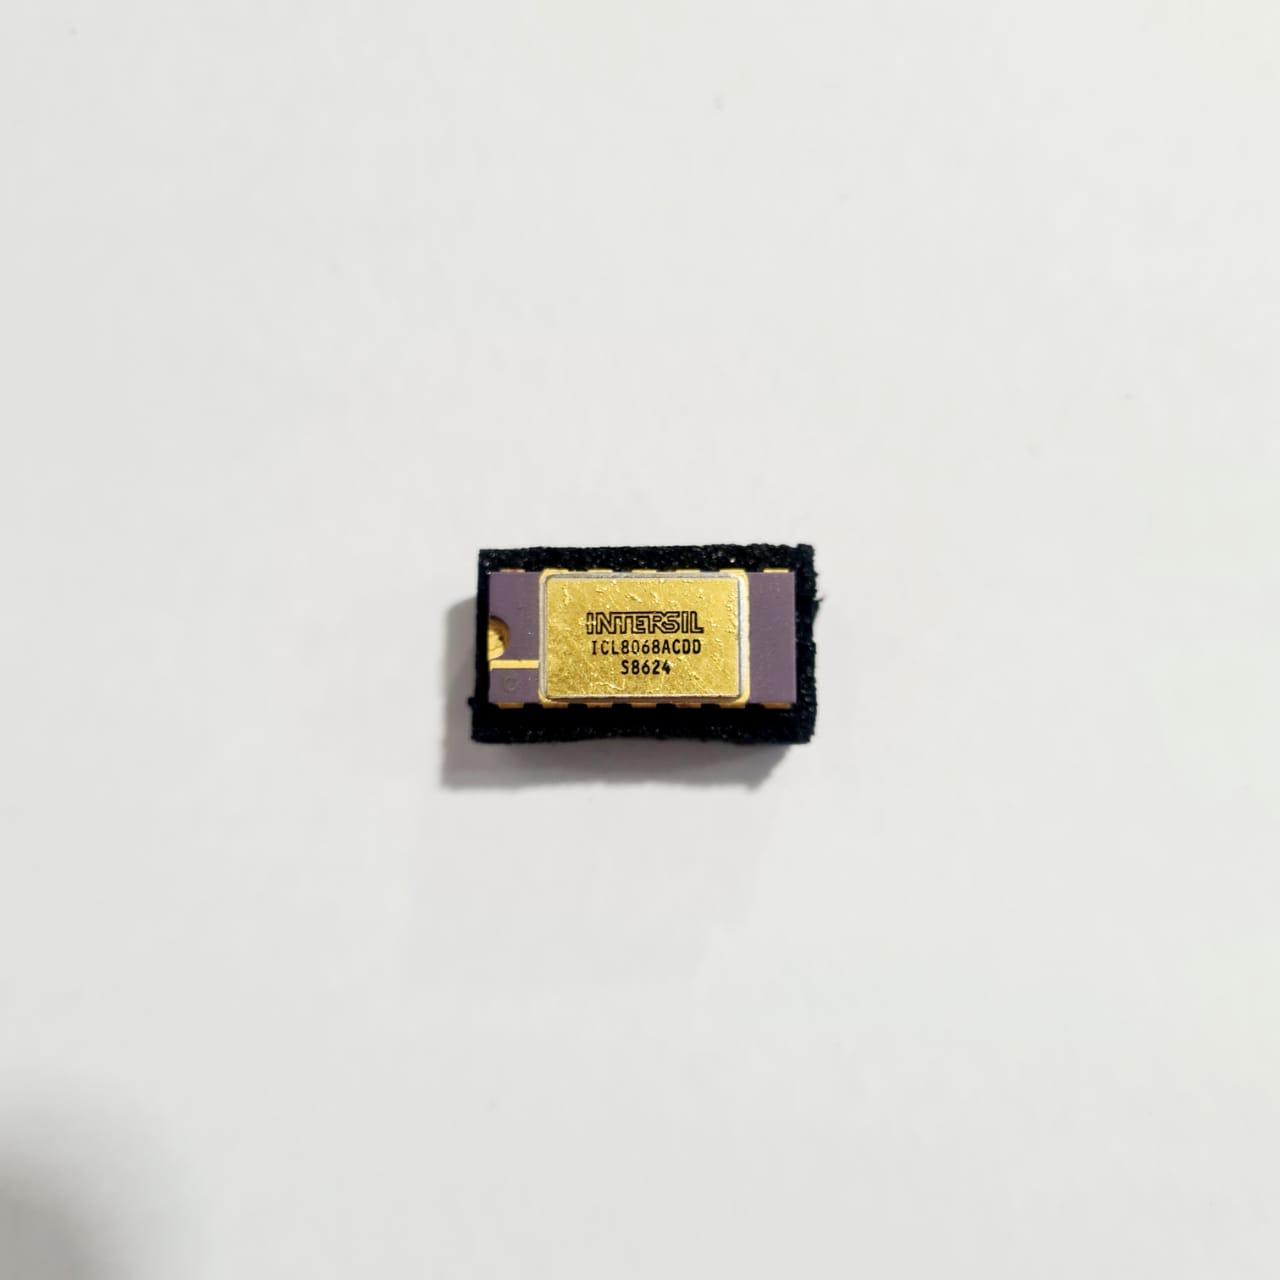 Circuito Integrado ICL8068ACDD Intersil 14-Bit/16-Bit CI 143